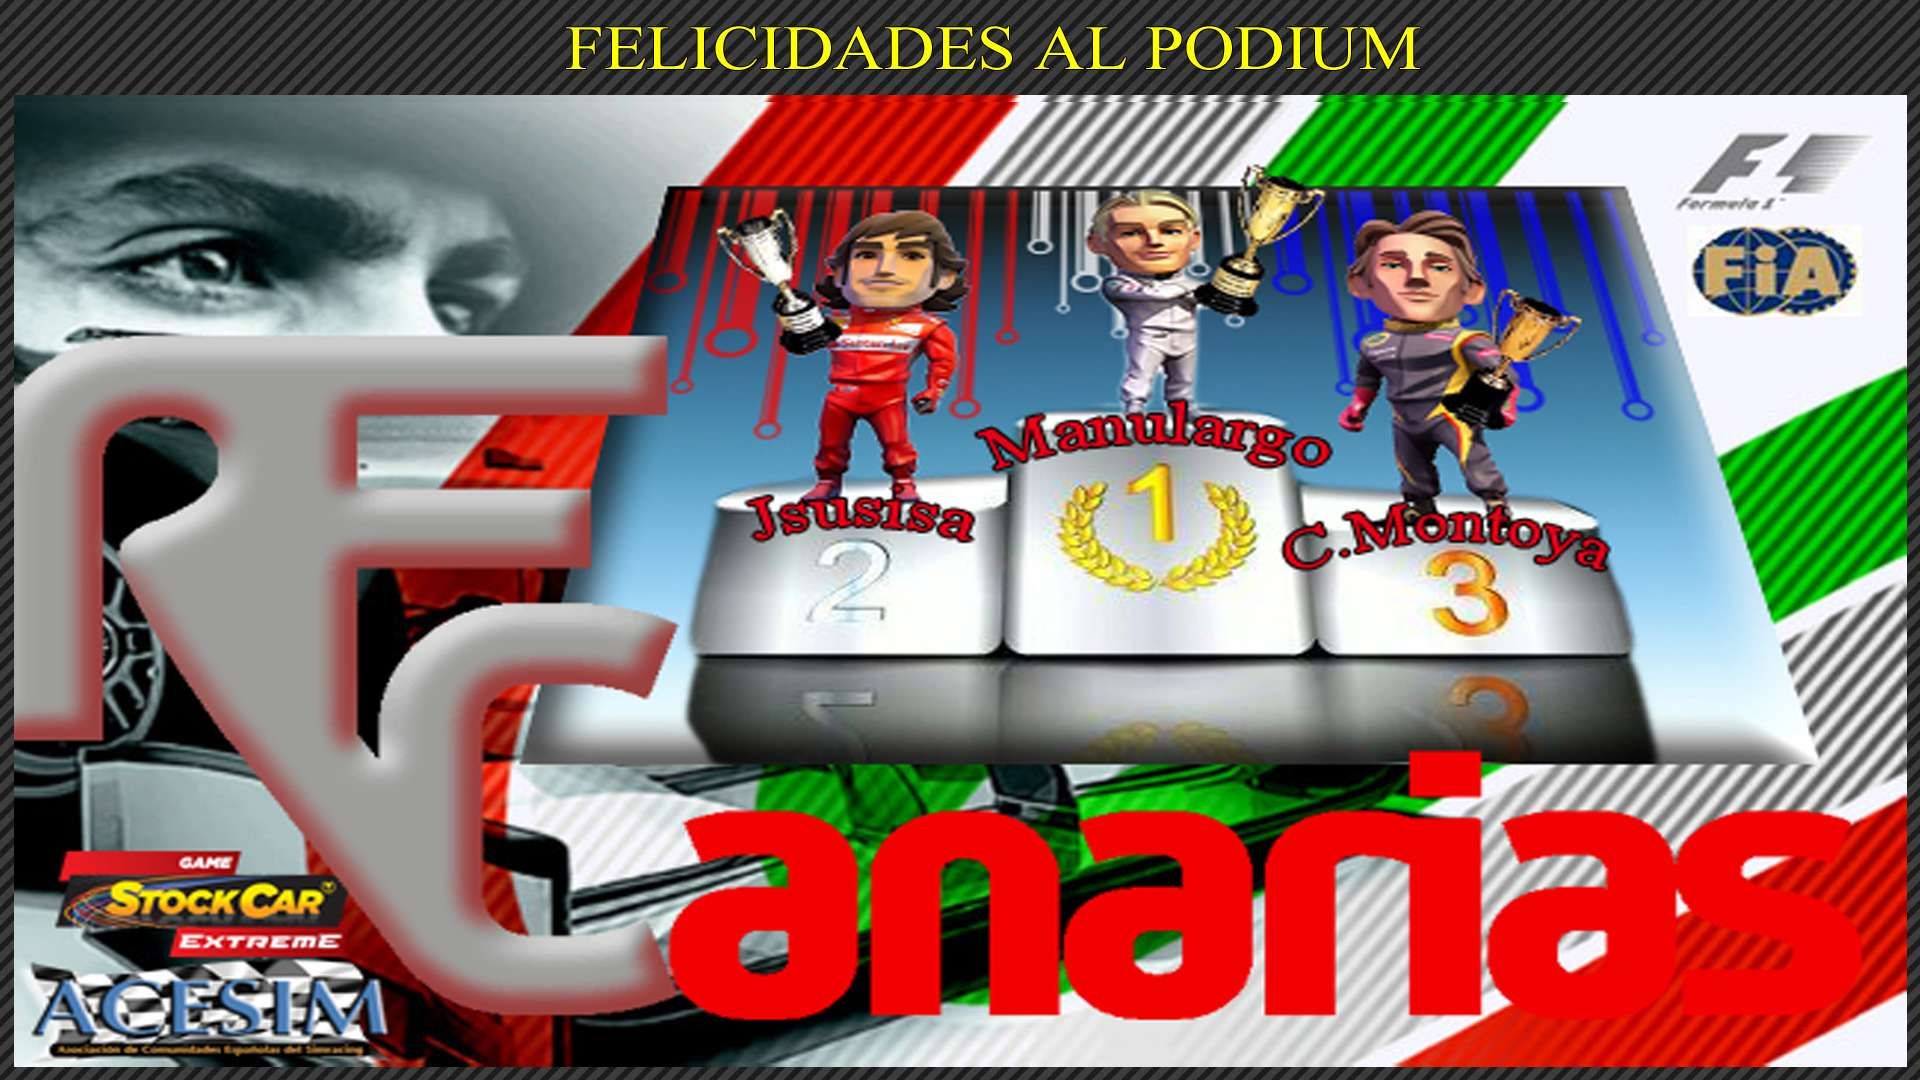 PRRESENTACION GP F1-2015 MONACO Podium27